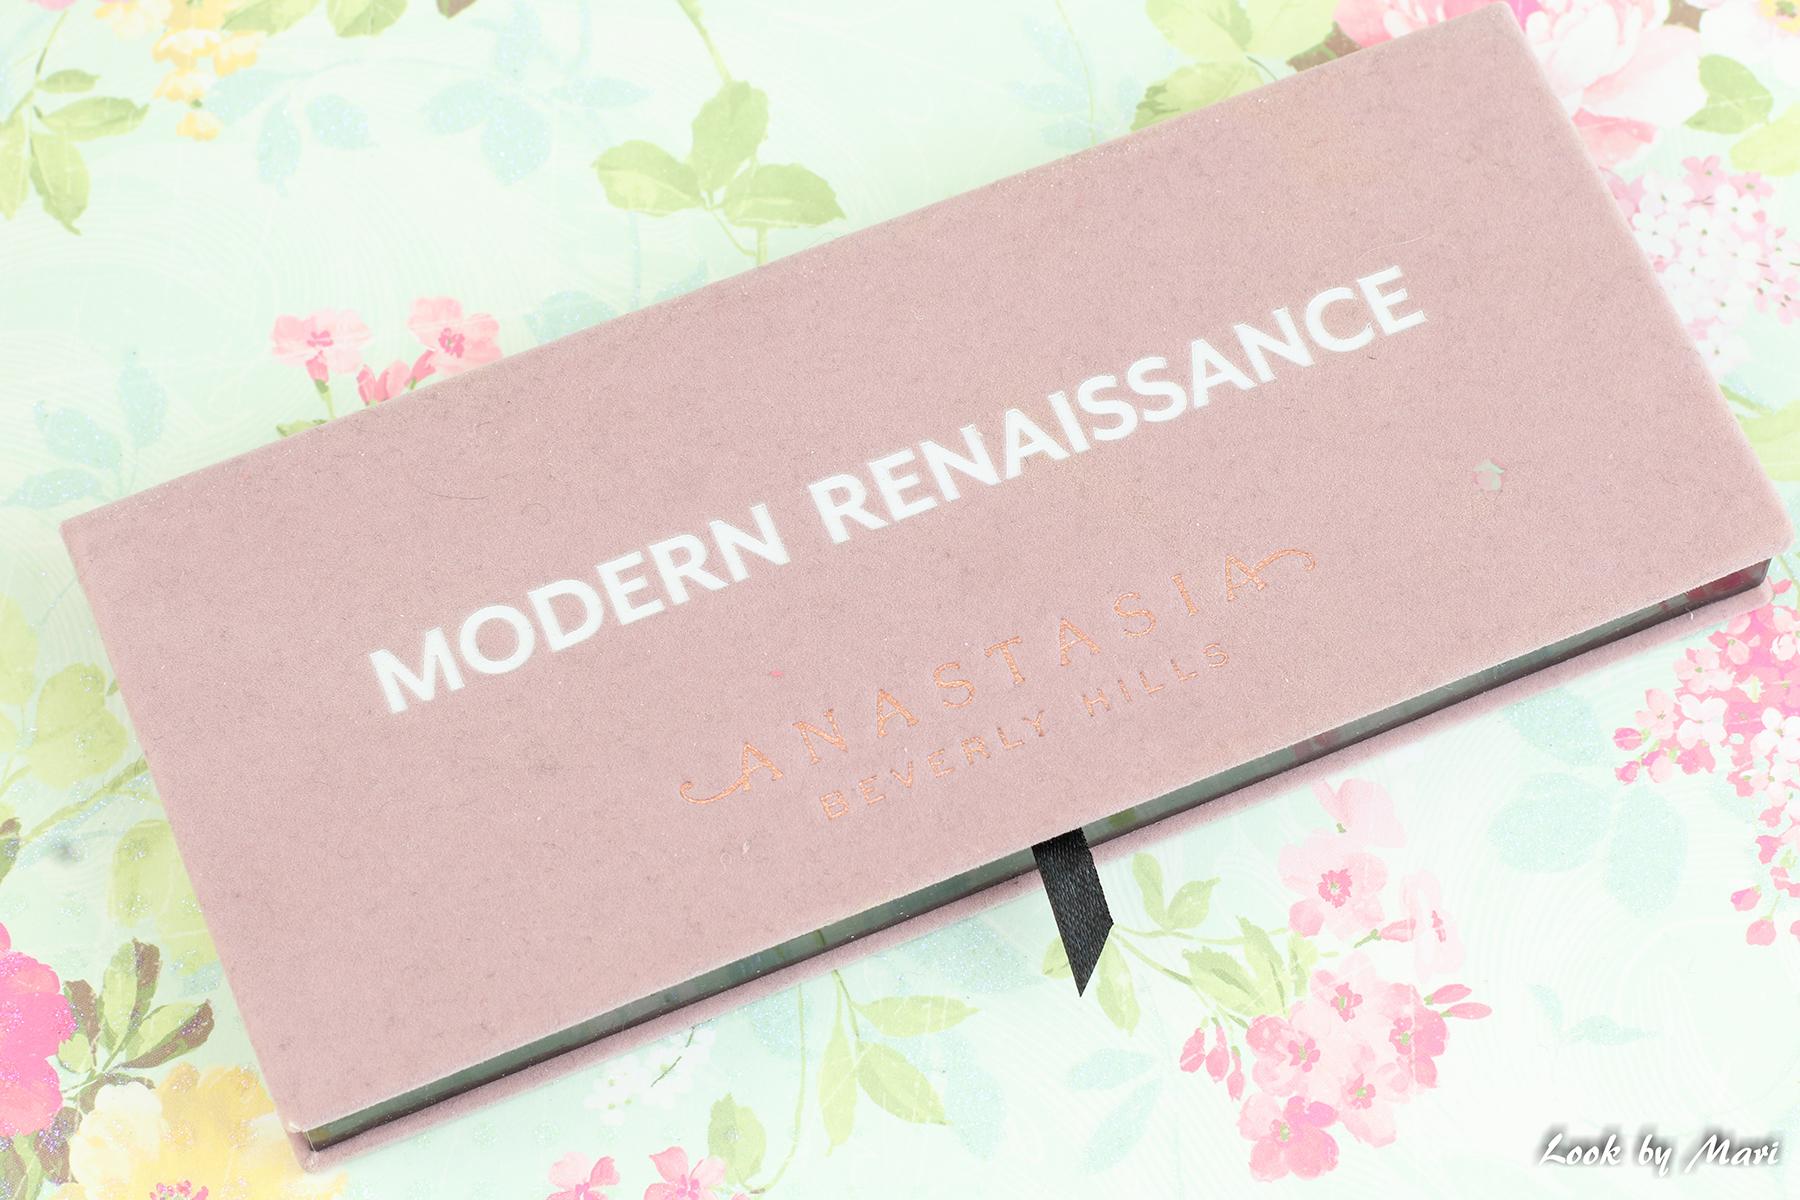 6 anastasia beverly hills modern renaissance palette kokemuksia värit sävyt review swatches cultbeau